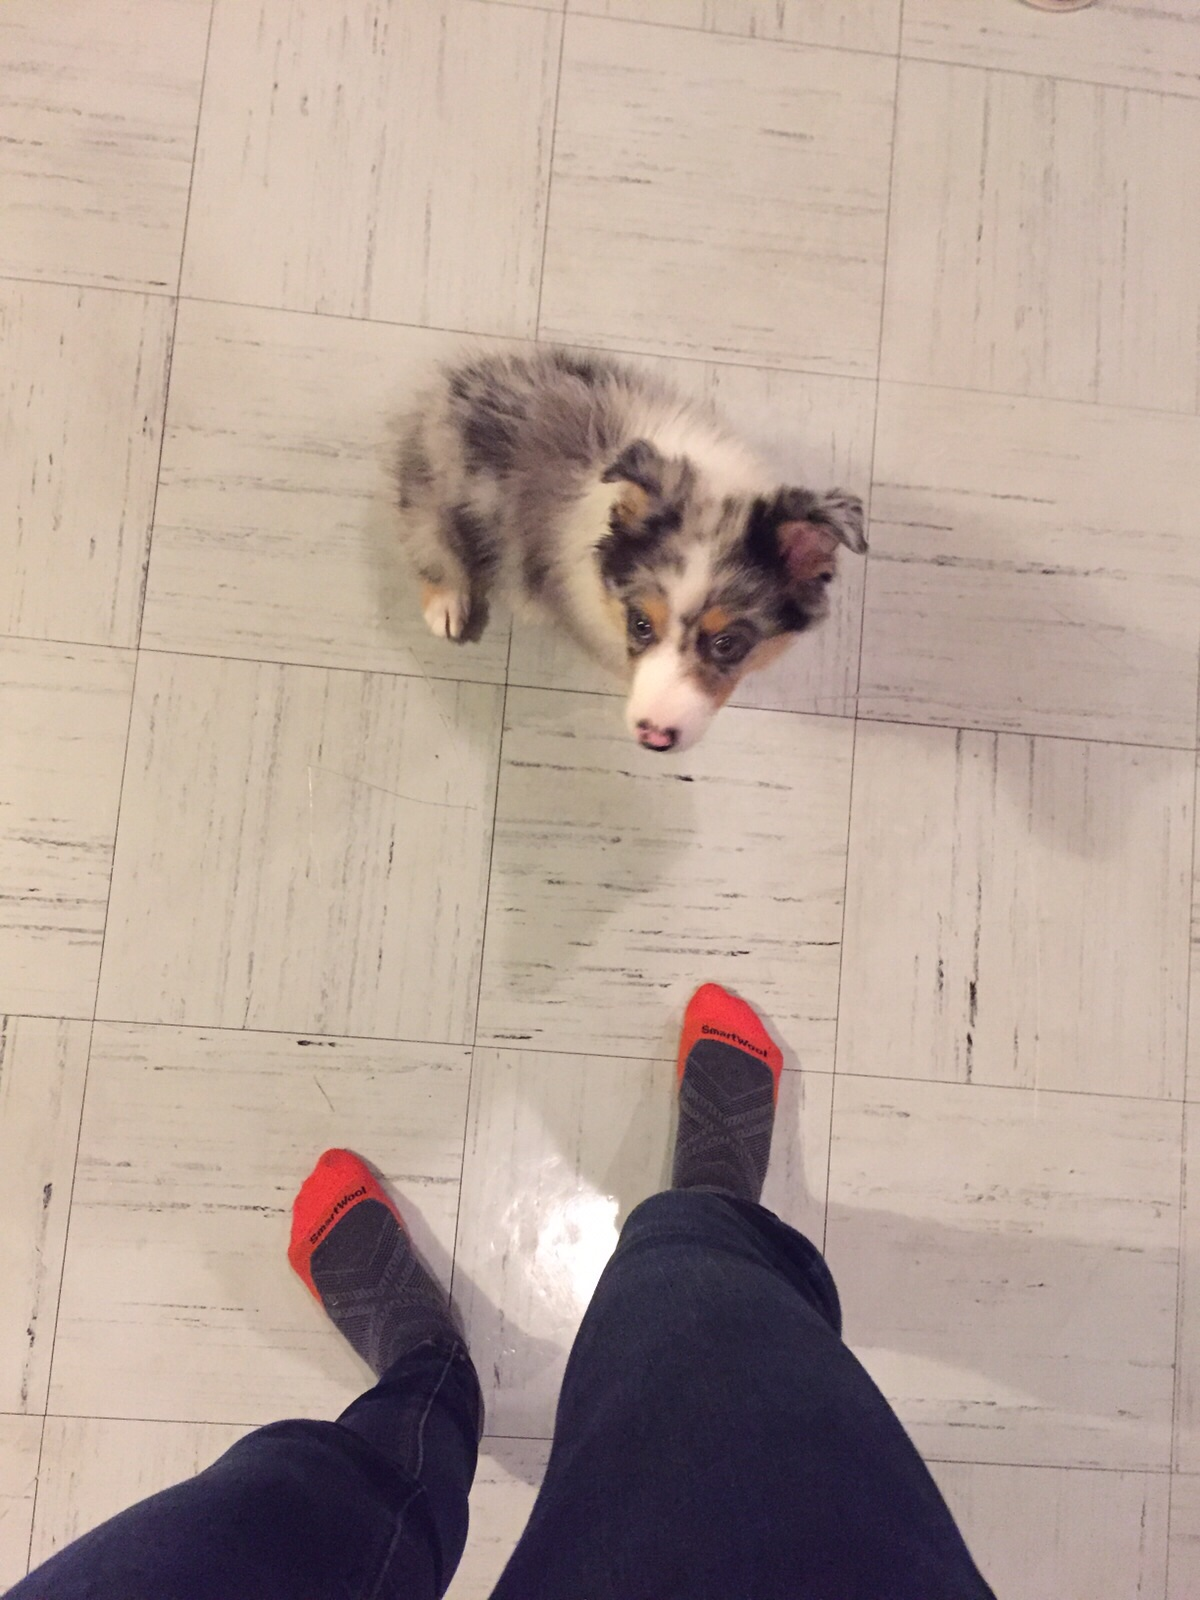 Lylo, our host Imran's cute puppy!